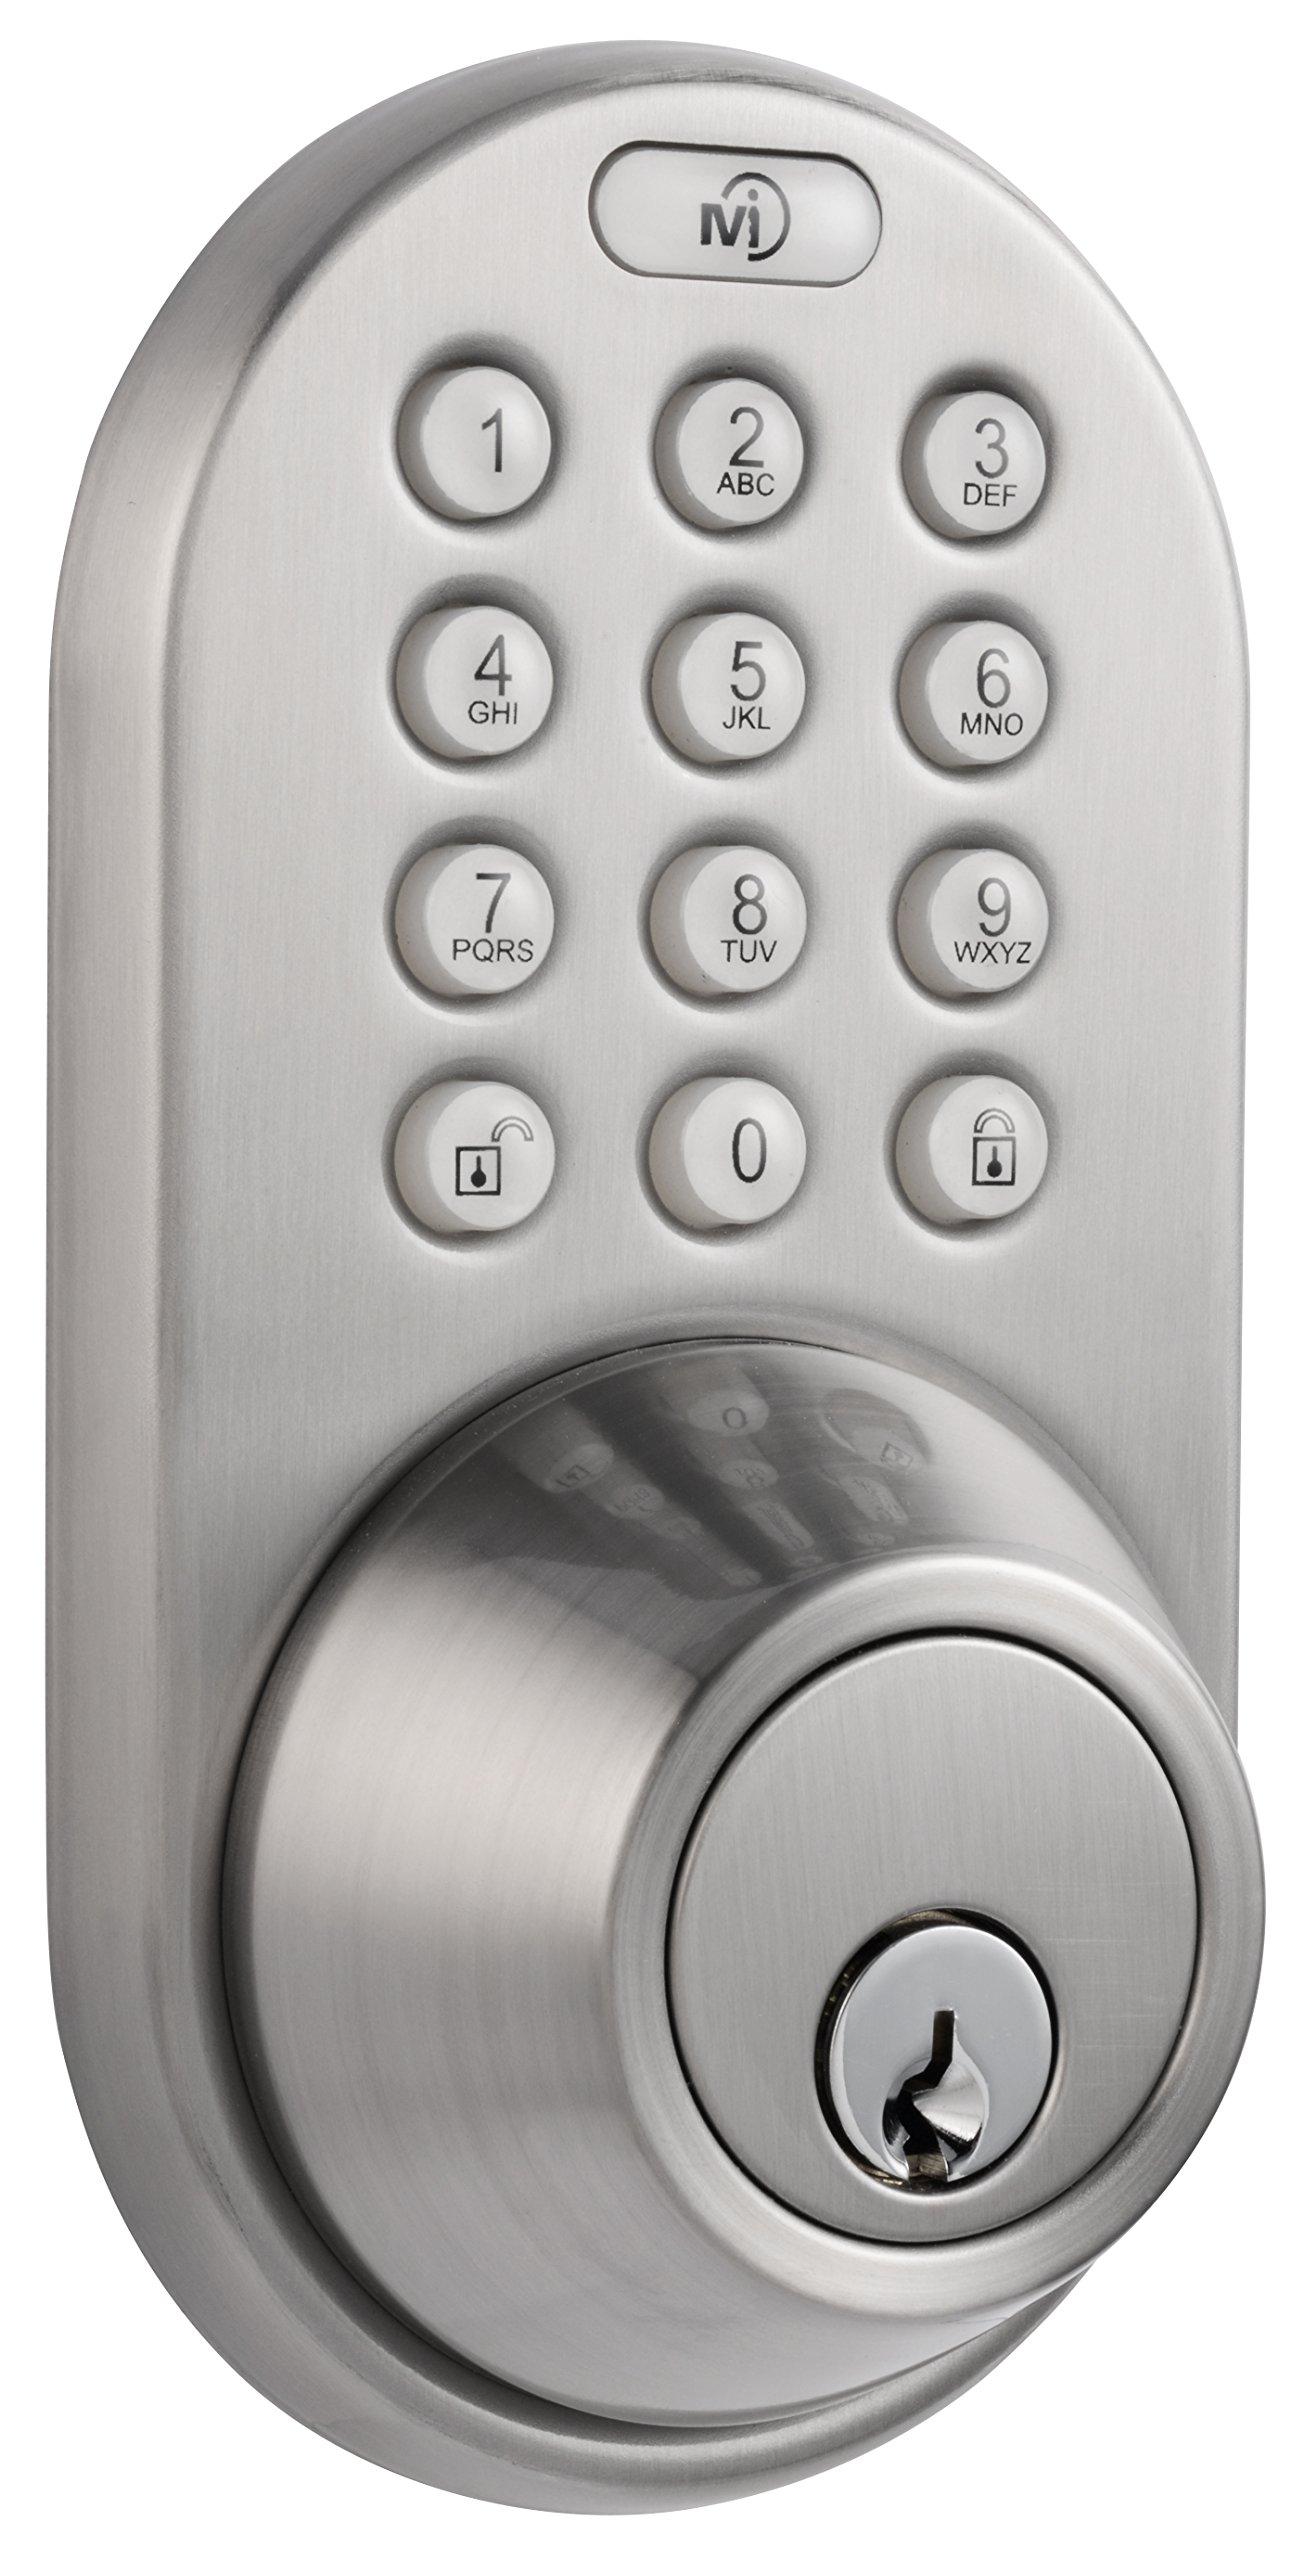 MiLocks DF-02SN Electronic Keyless Entry Touchpad Deadbolt Door Lock by MiLocks (Image #1)